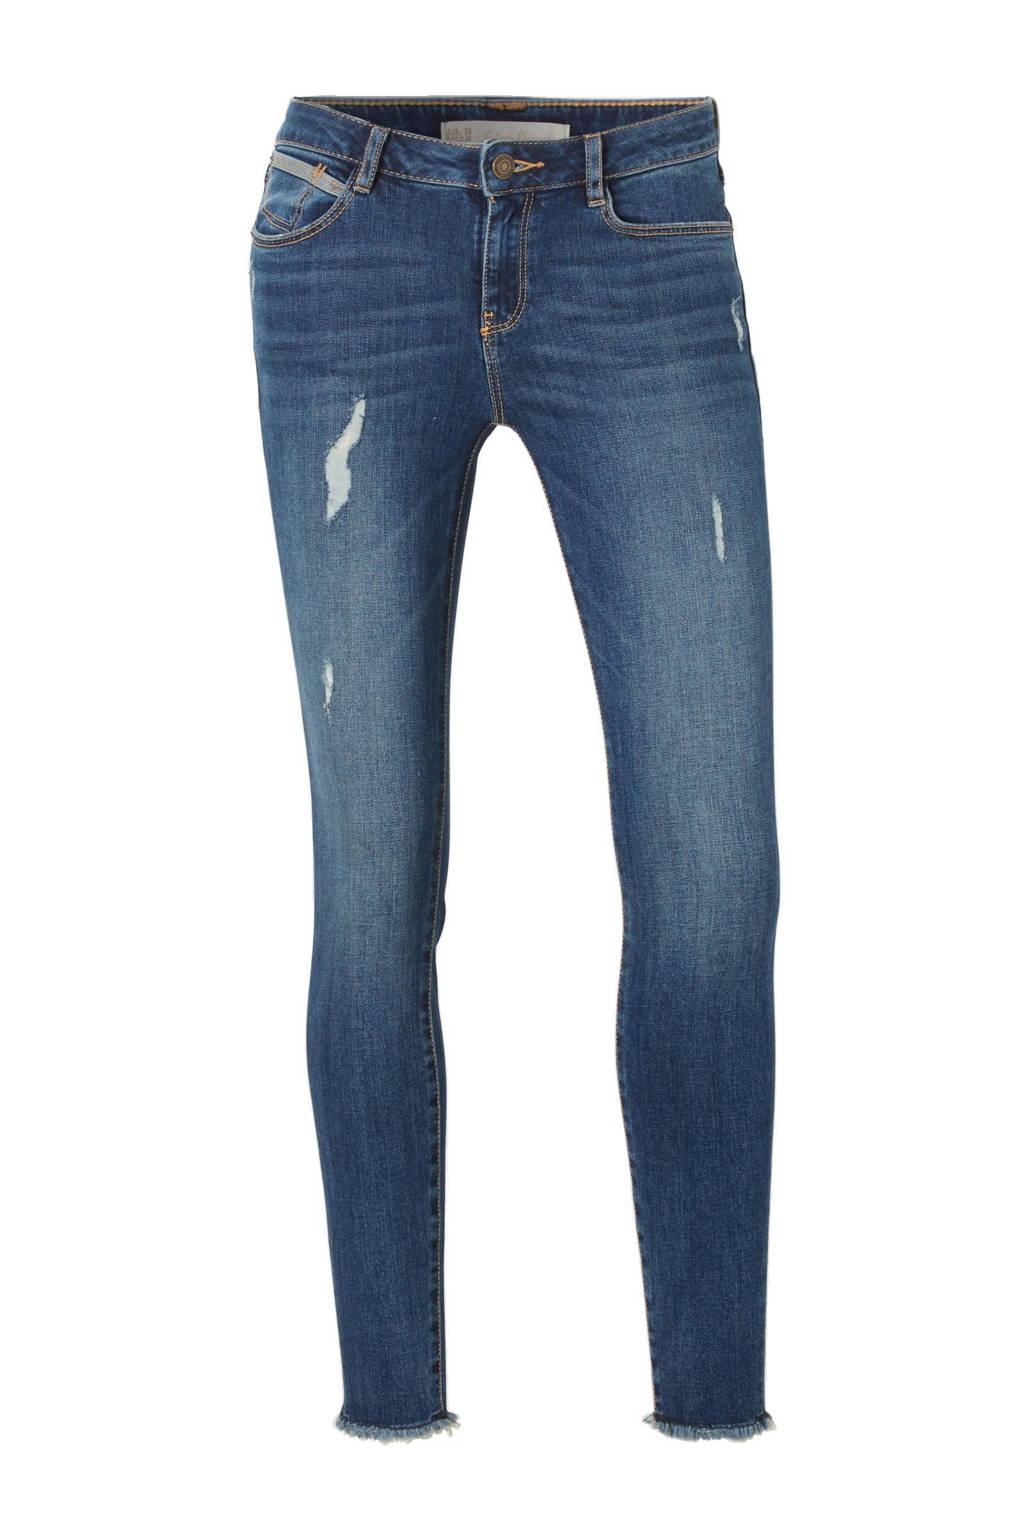 C&A Clockhouse skinny jeans, Blauw